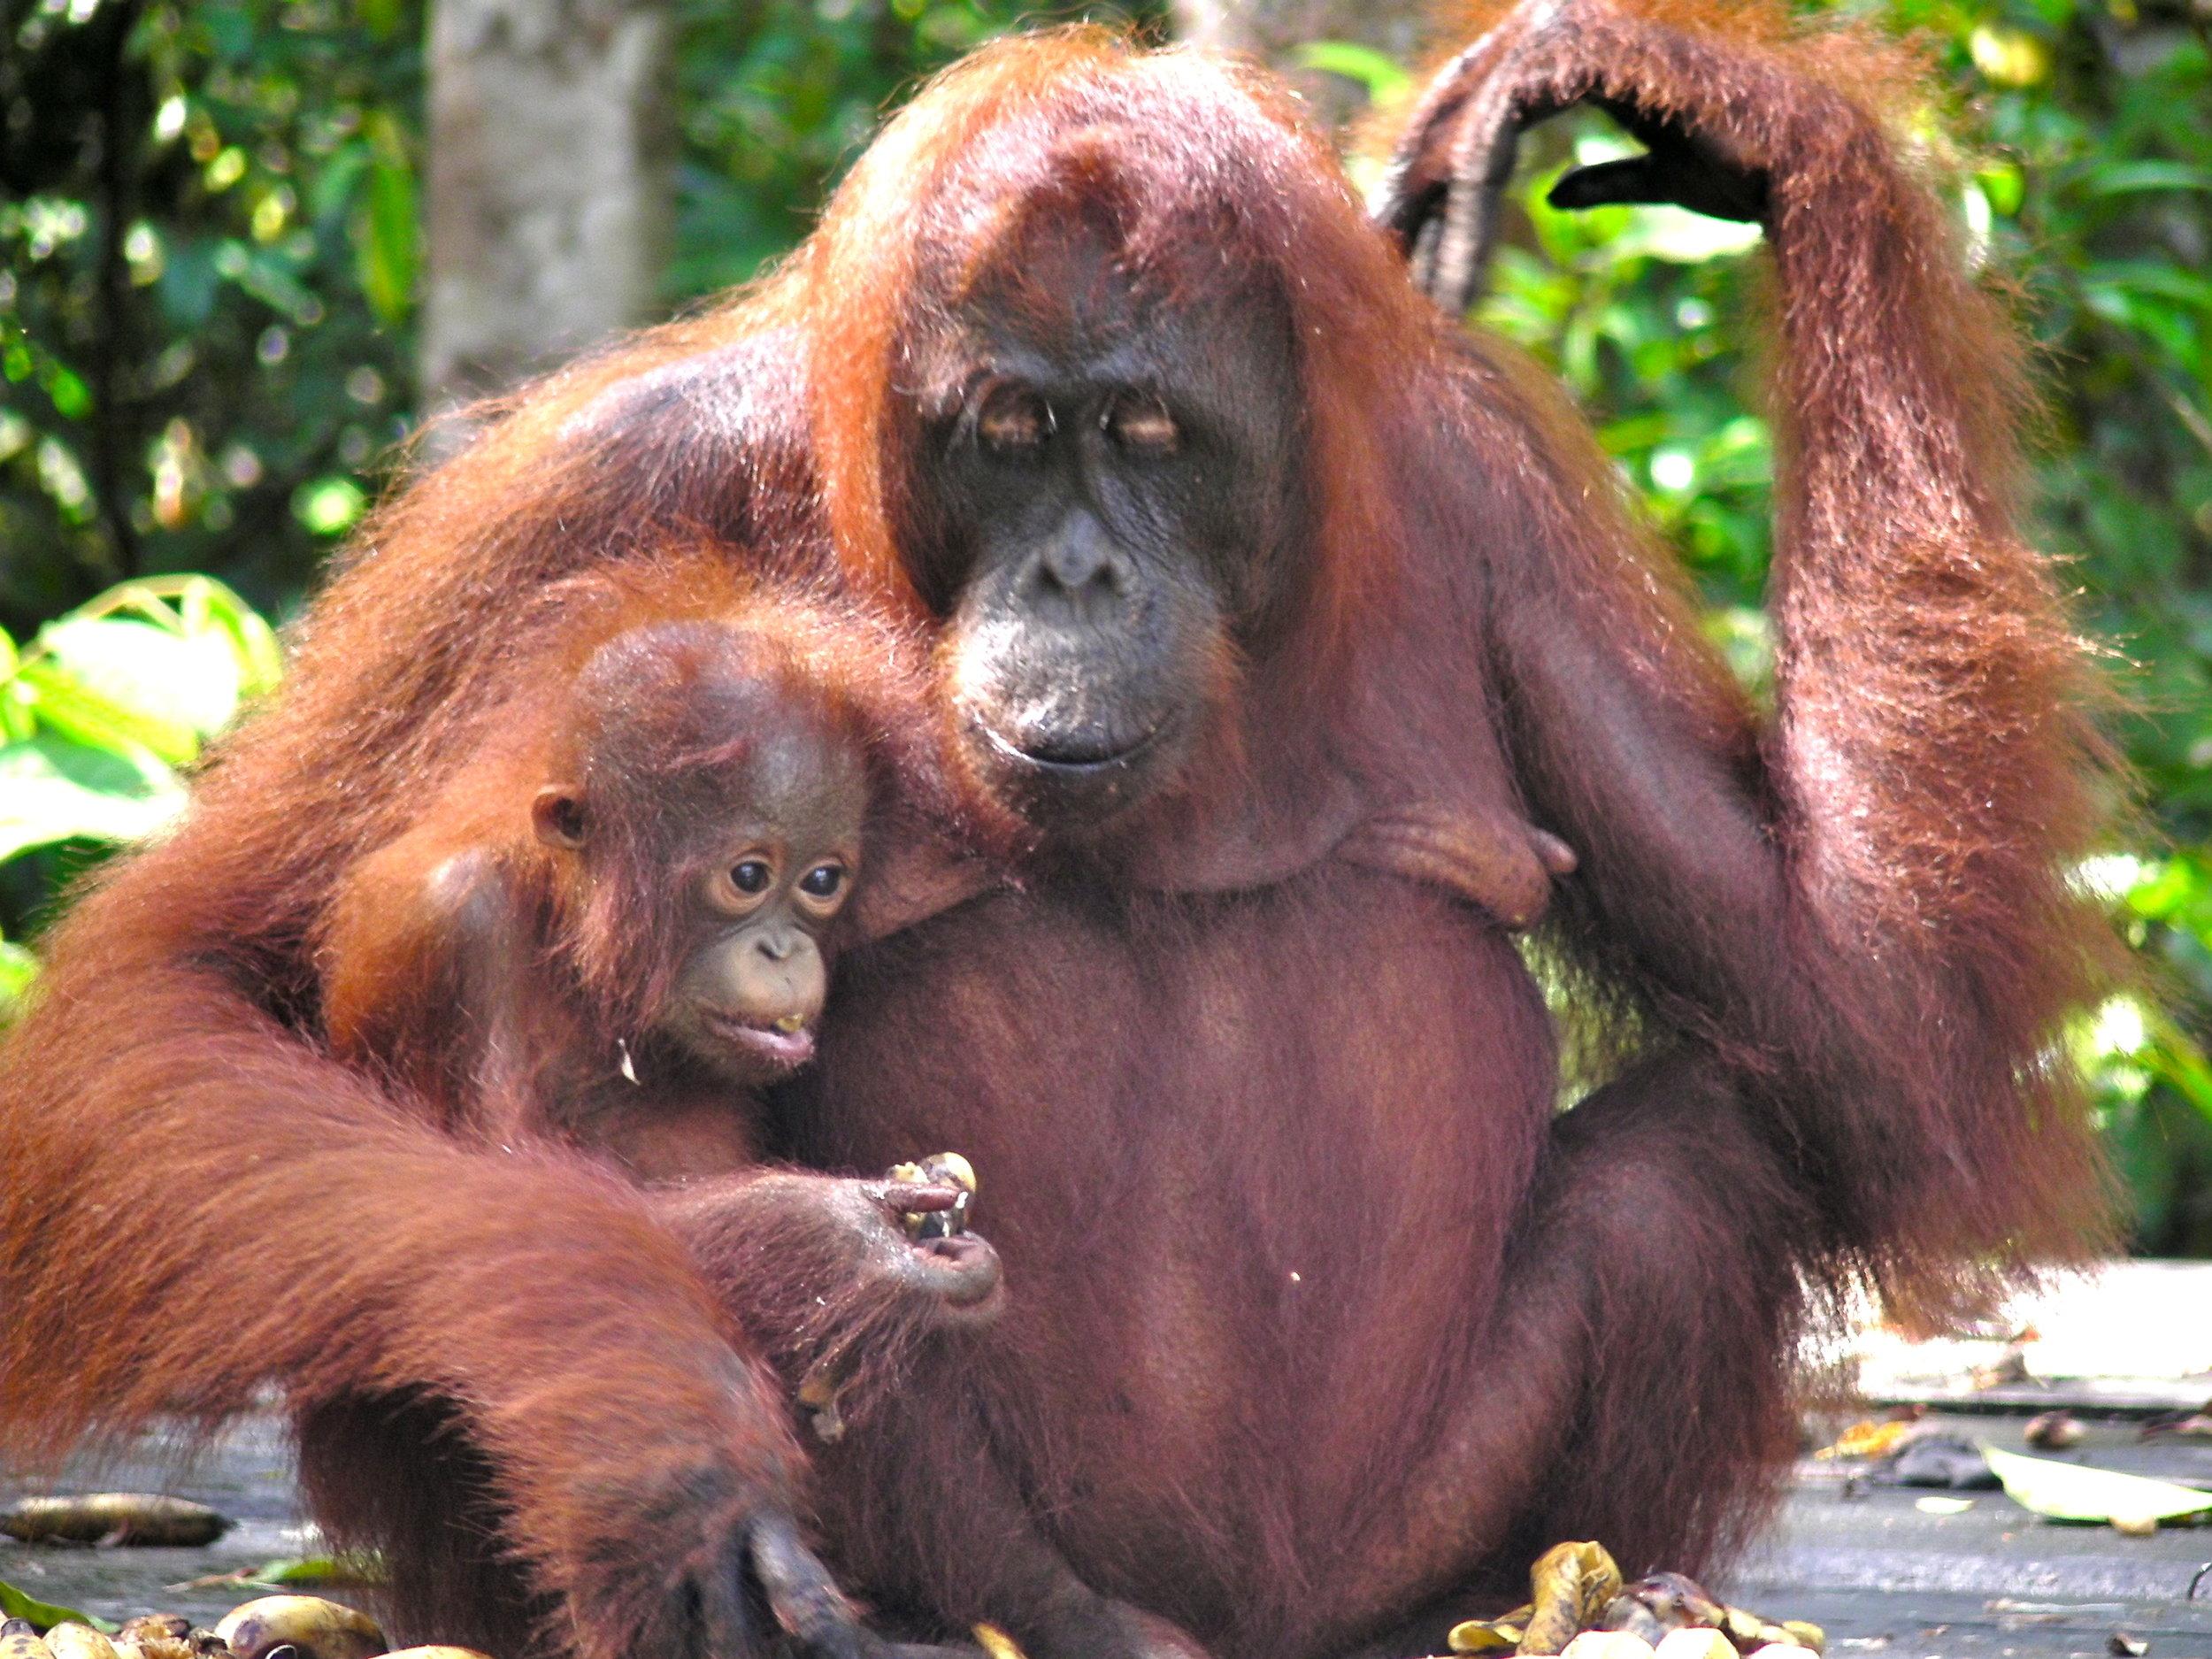 The victims of palm oil: Mama and baby orangutan in Borneo